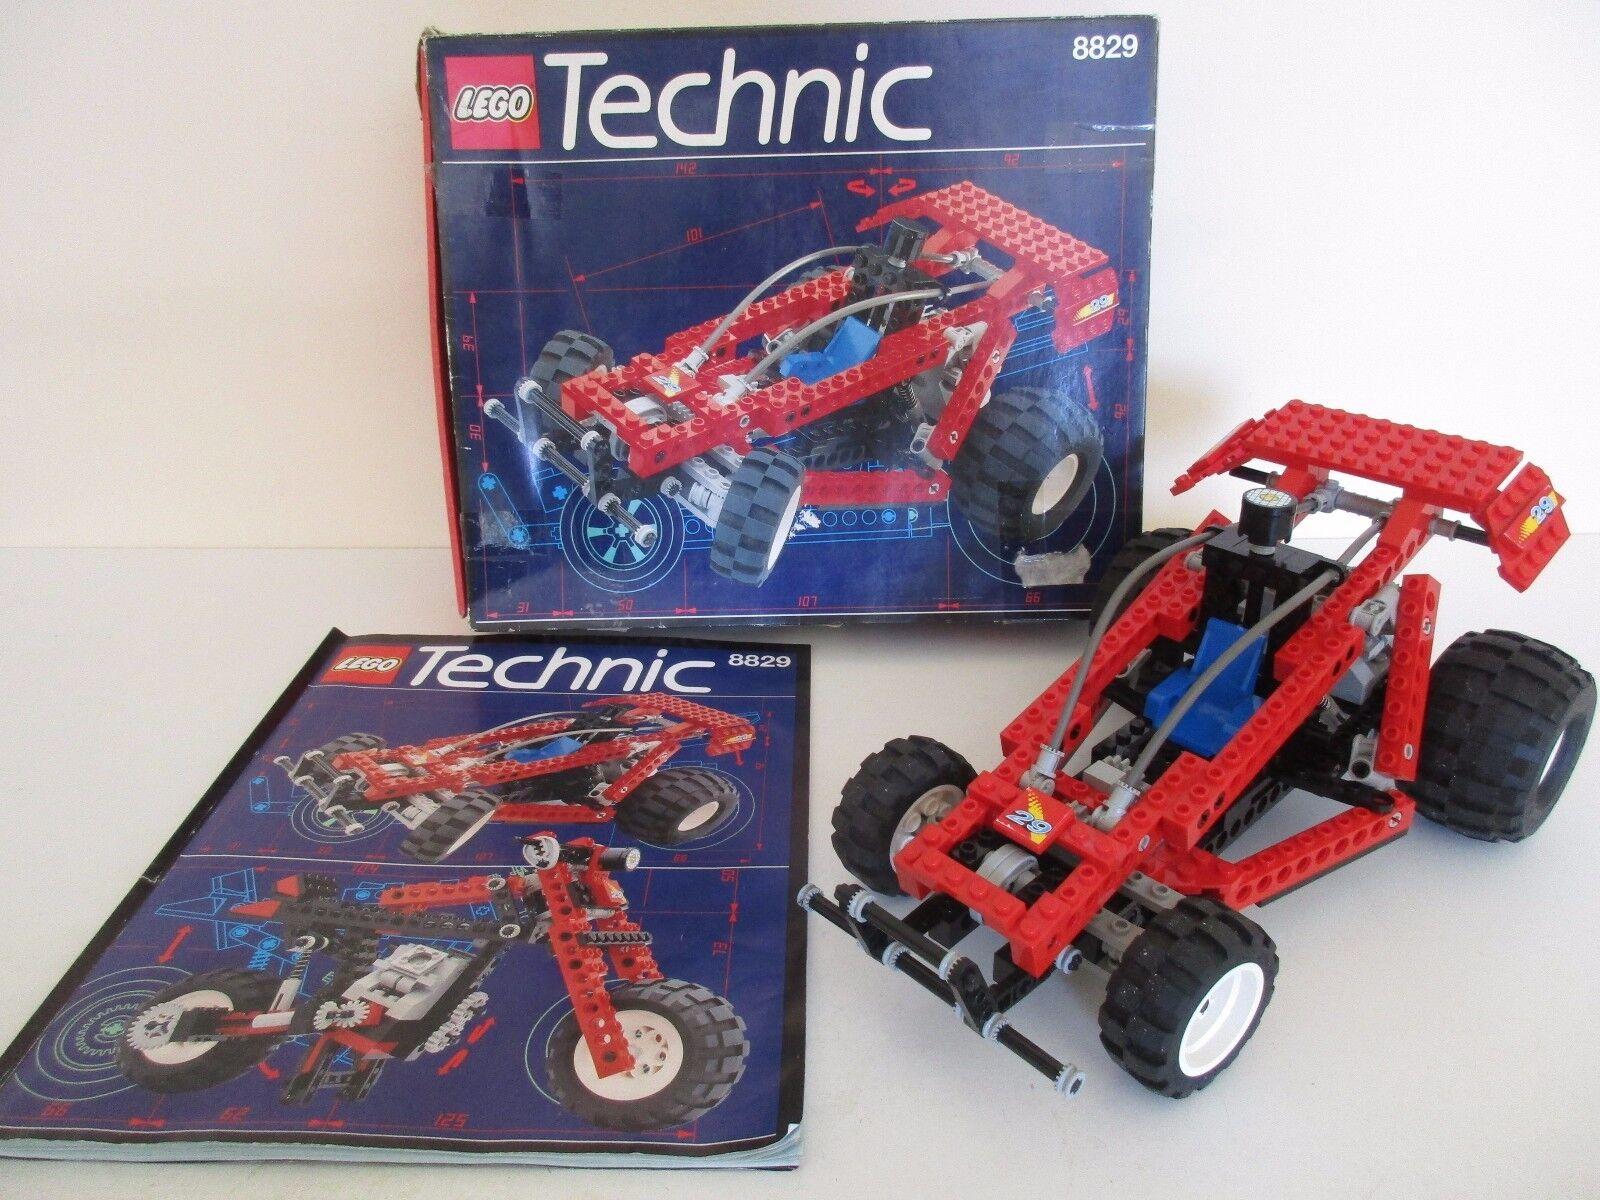 LEGO TECHNIC 8829 DUNE BLASTER - COMPLET boite & instructions - LEGO 1994